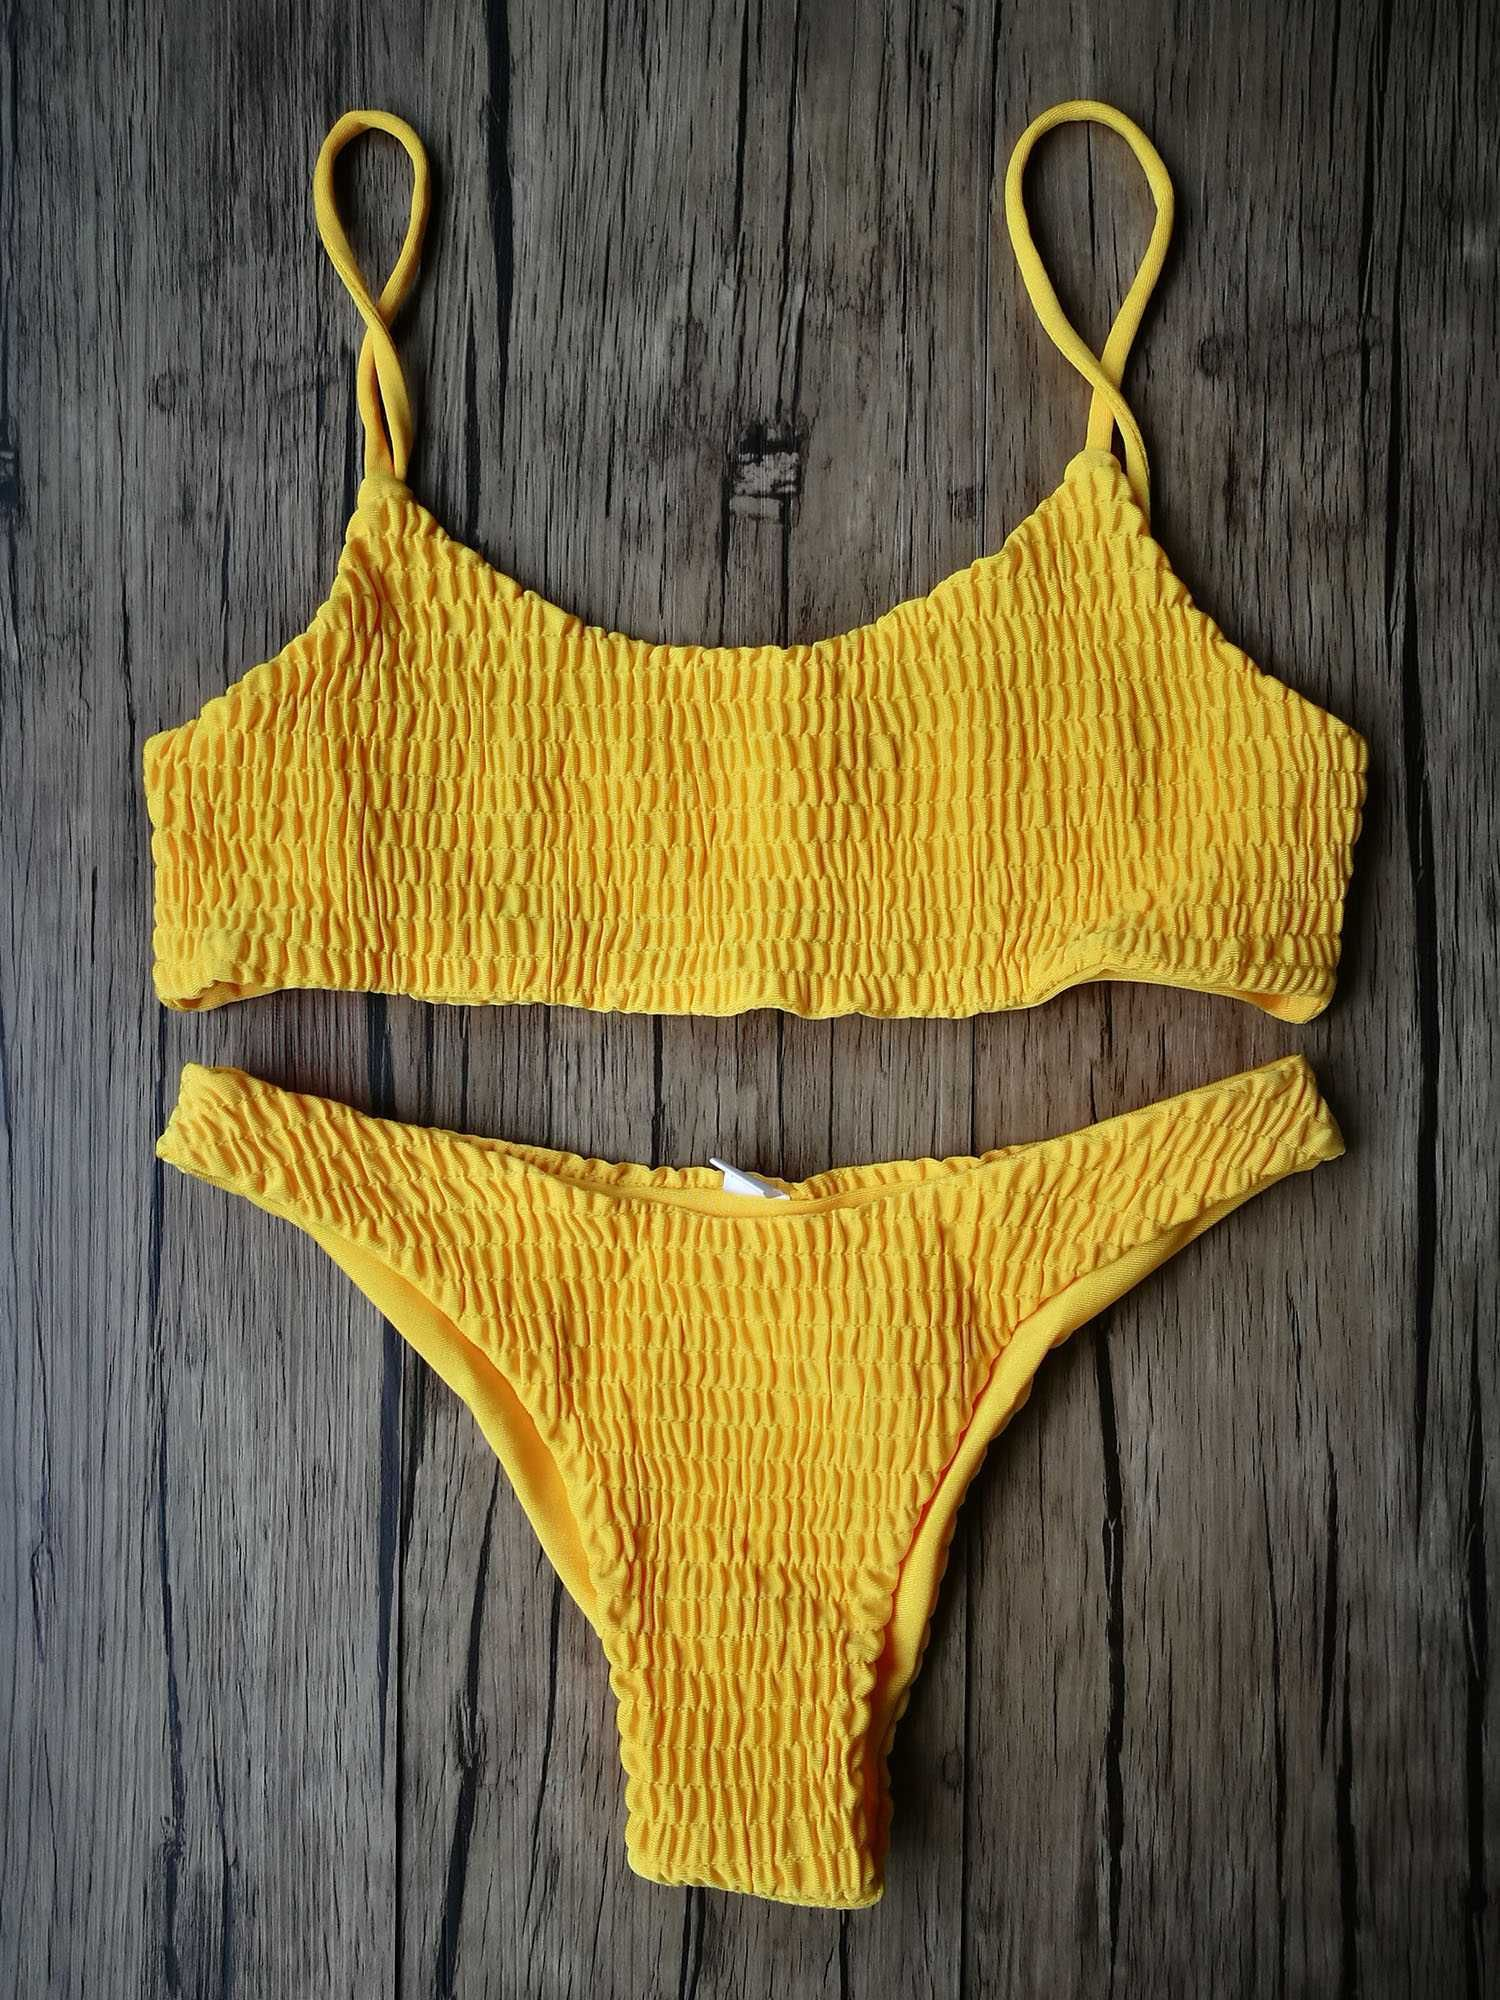 2bdb4c44d7 15% OFF resorts wear for womens swim. yellow bikini set mustard seamless bathing  suit crop top swimming clothes